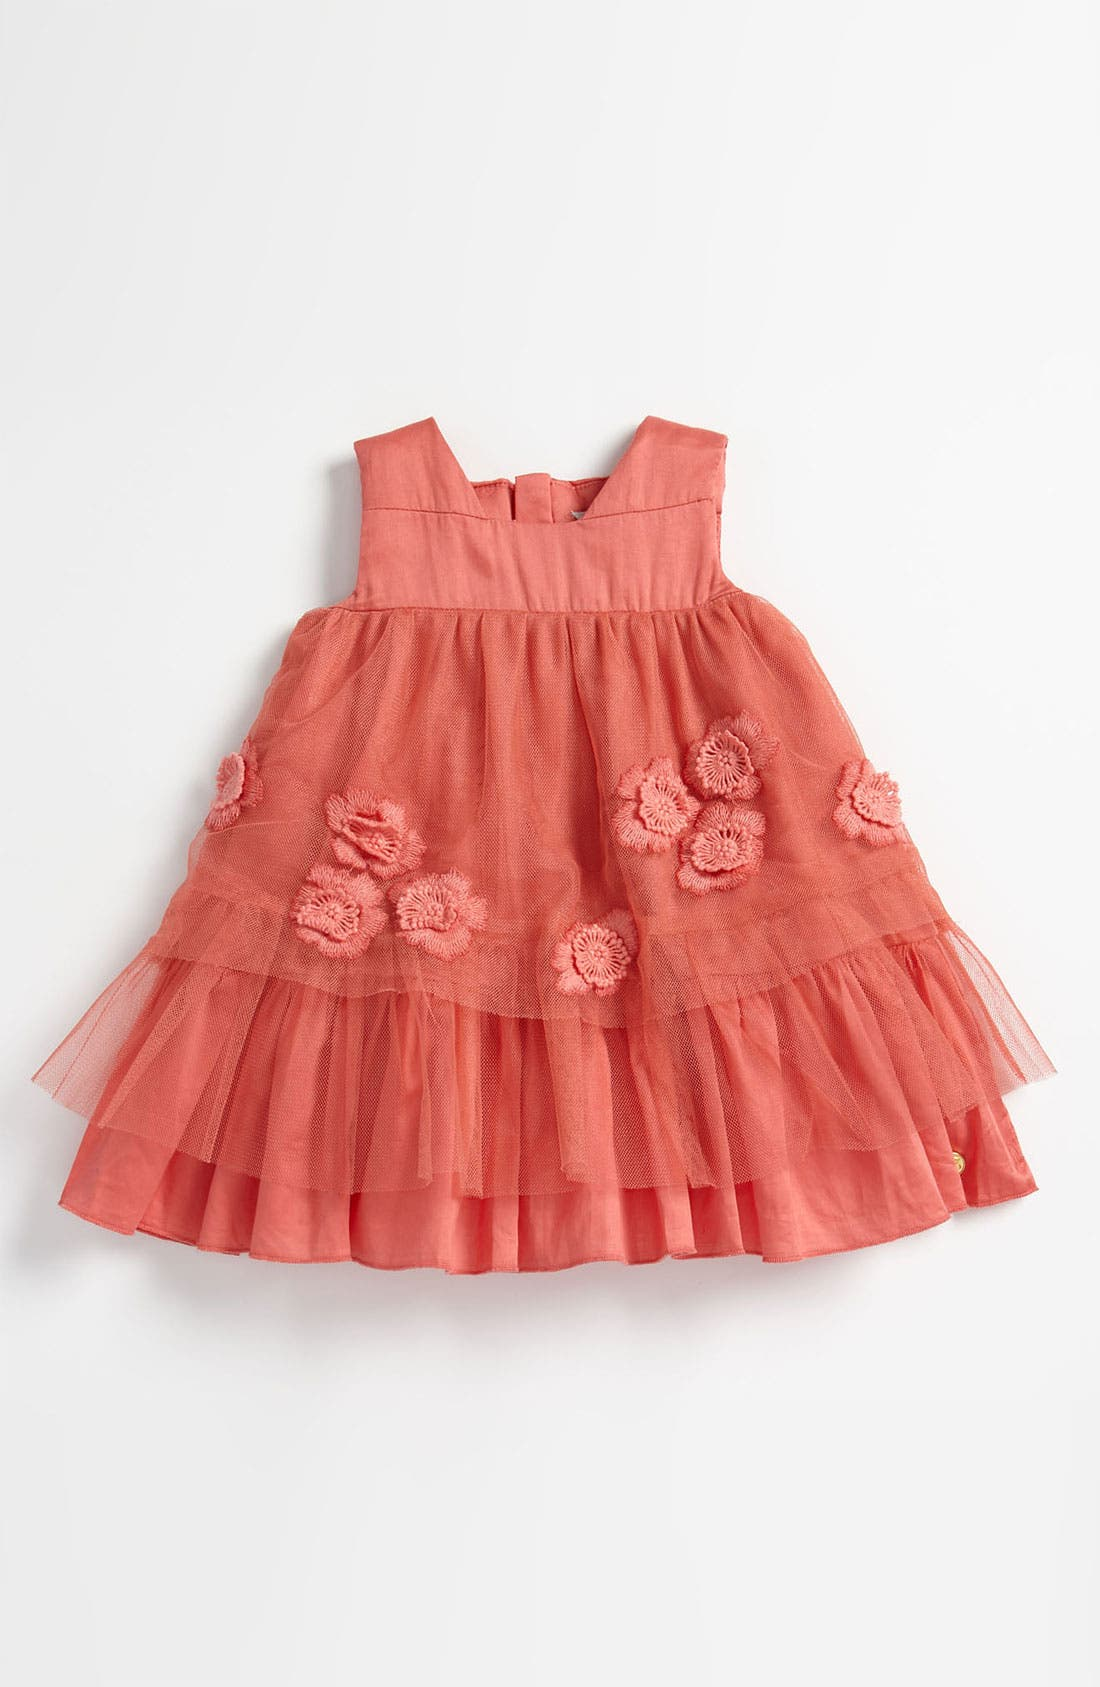 Main Image - LITTLE MARC JACOBS Tulle Dress (Infant)